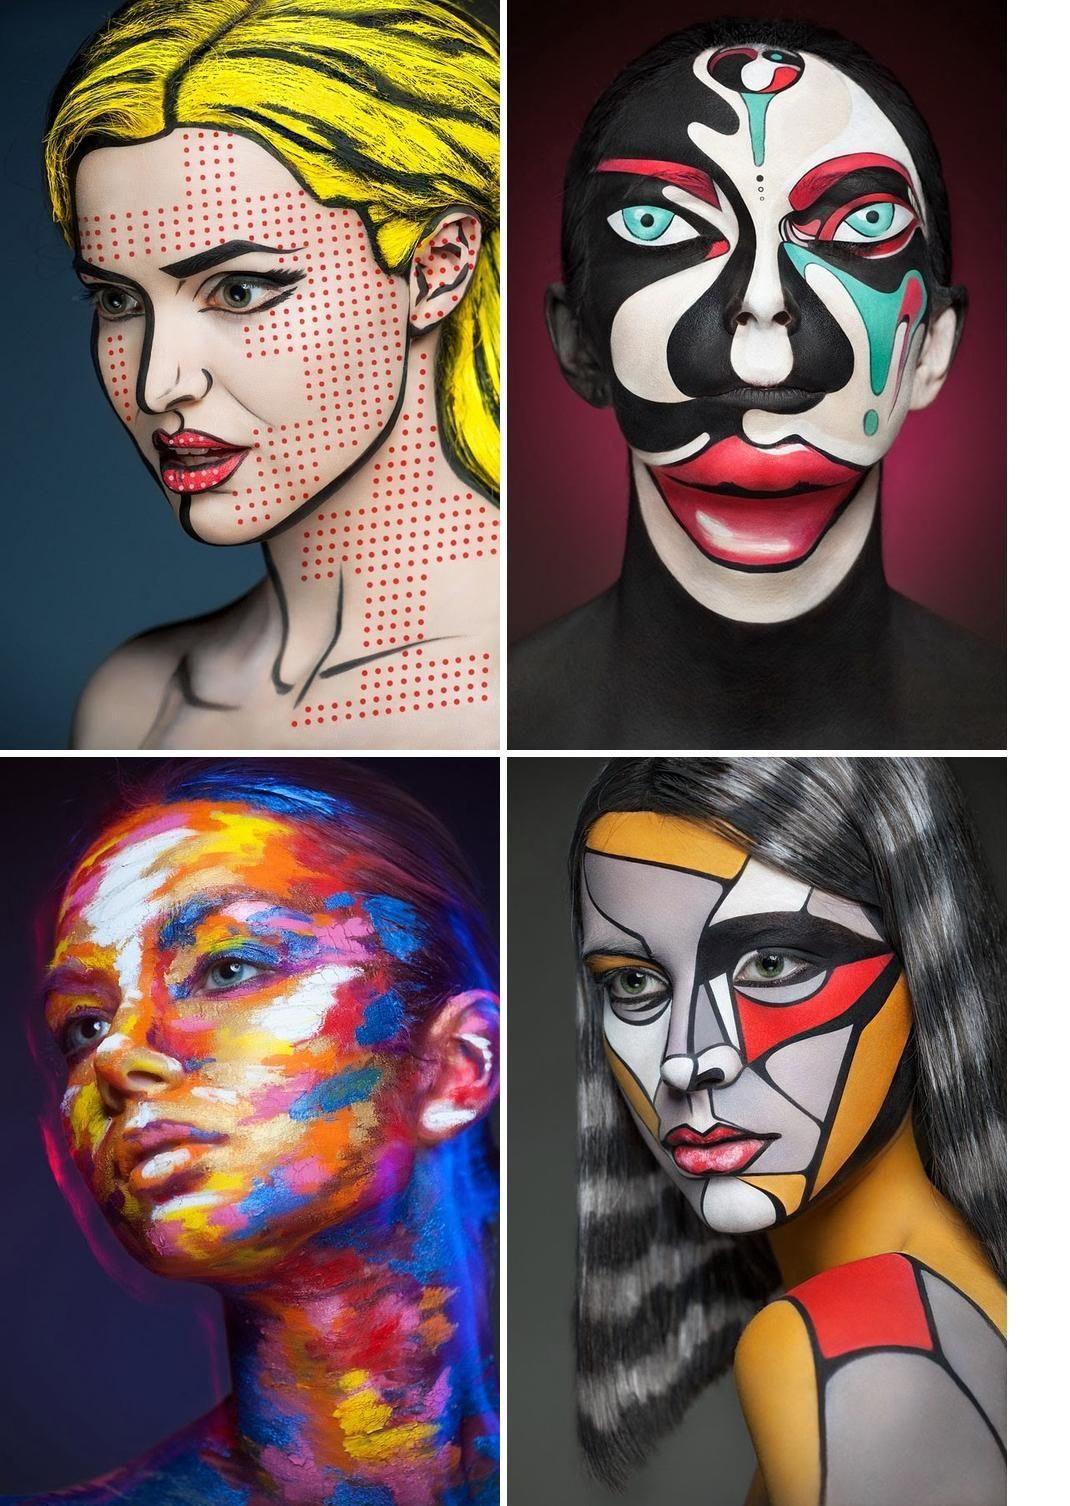 art of face photography by alexander khokhlov colors. Black Bedroom Furniture Sets. Home Design Ideas